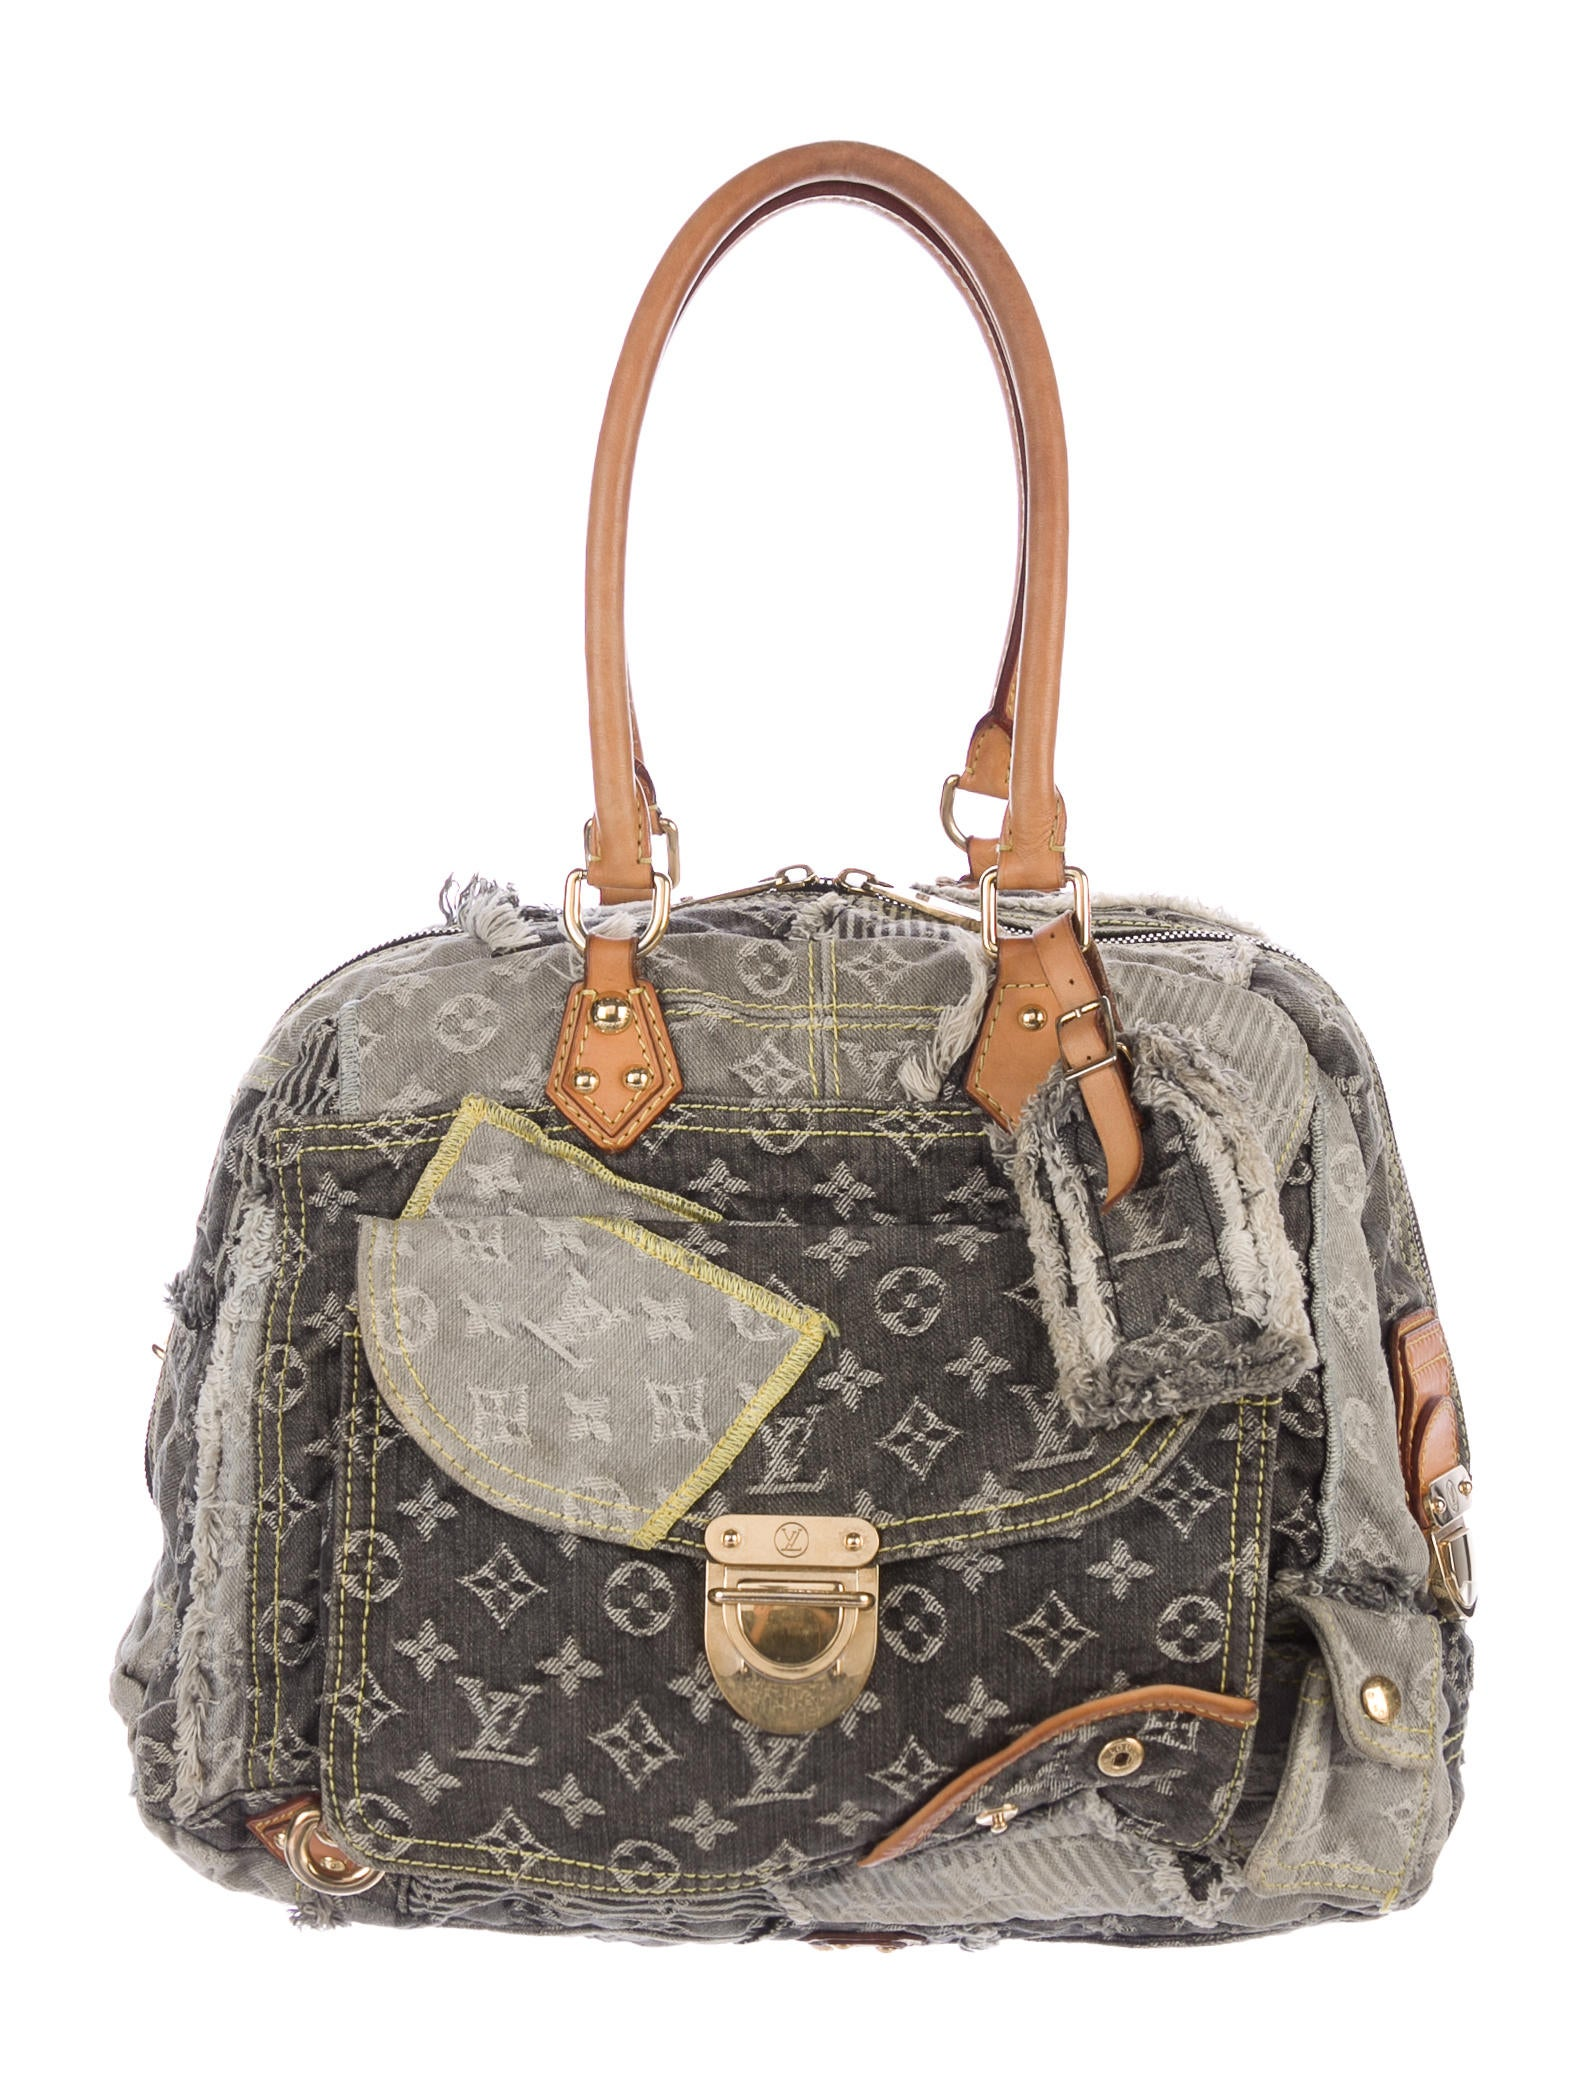 Louis Vuitton Patchwork Denim Bowly Bag - Handbags - LOU134079 | The RealReal